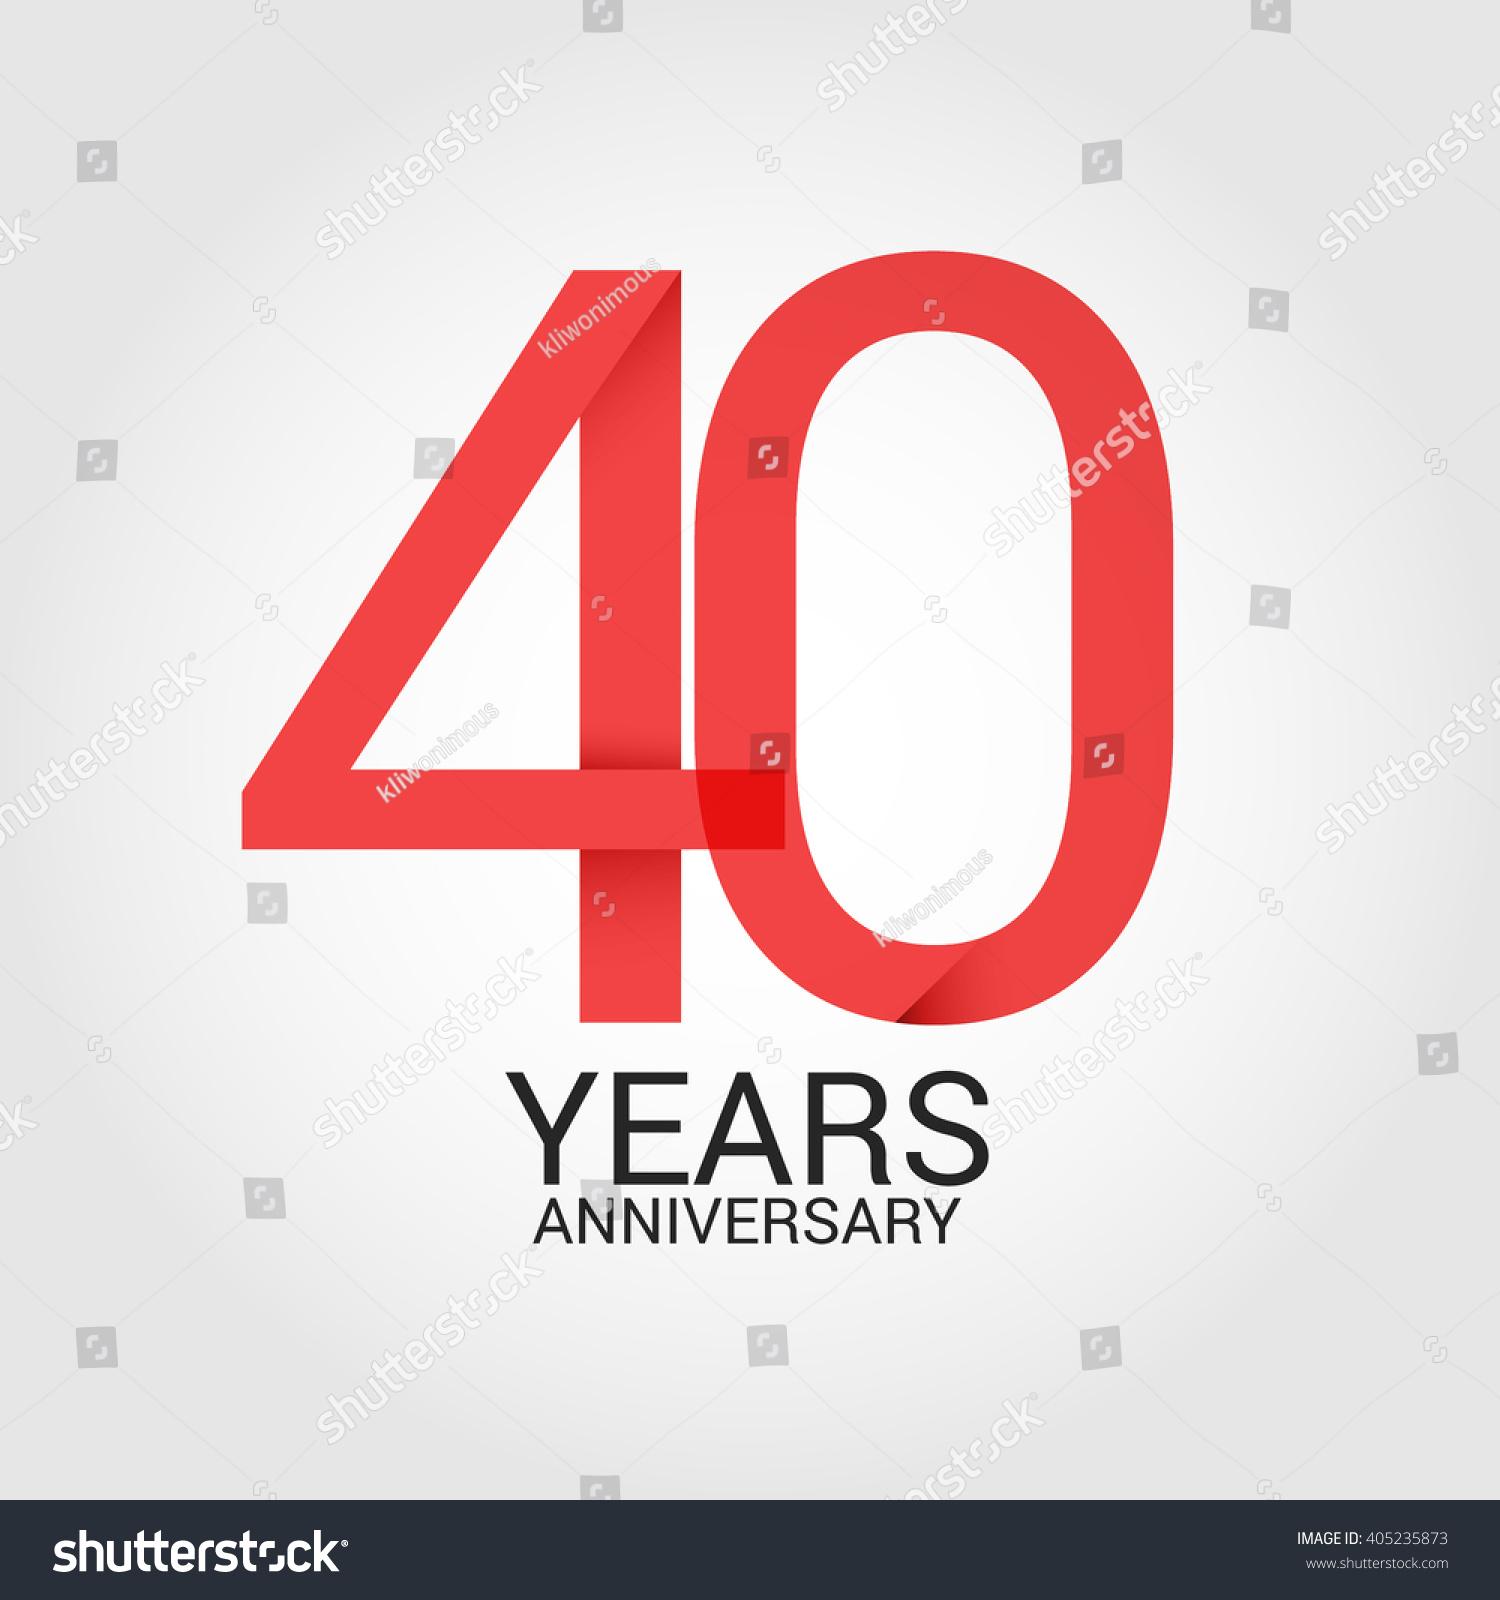 40 years anniversary signs symbols simple stock vector 405235873 40 years anniversary signs symbols simple stock vector 405235873 shutterstock buycottarizona Choice Image